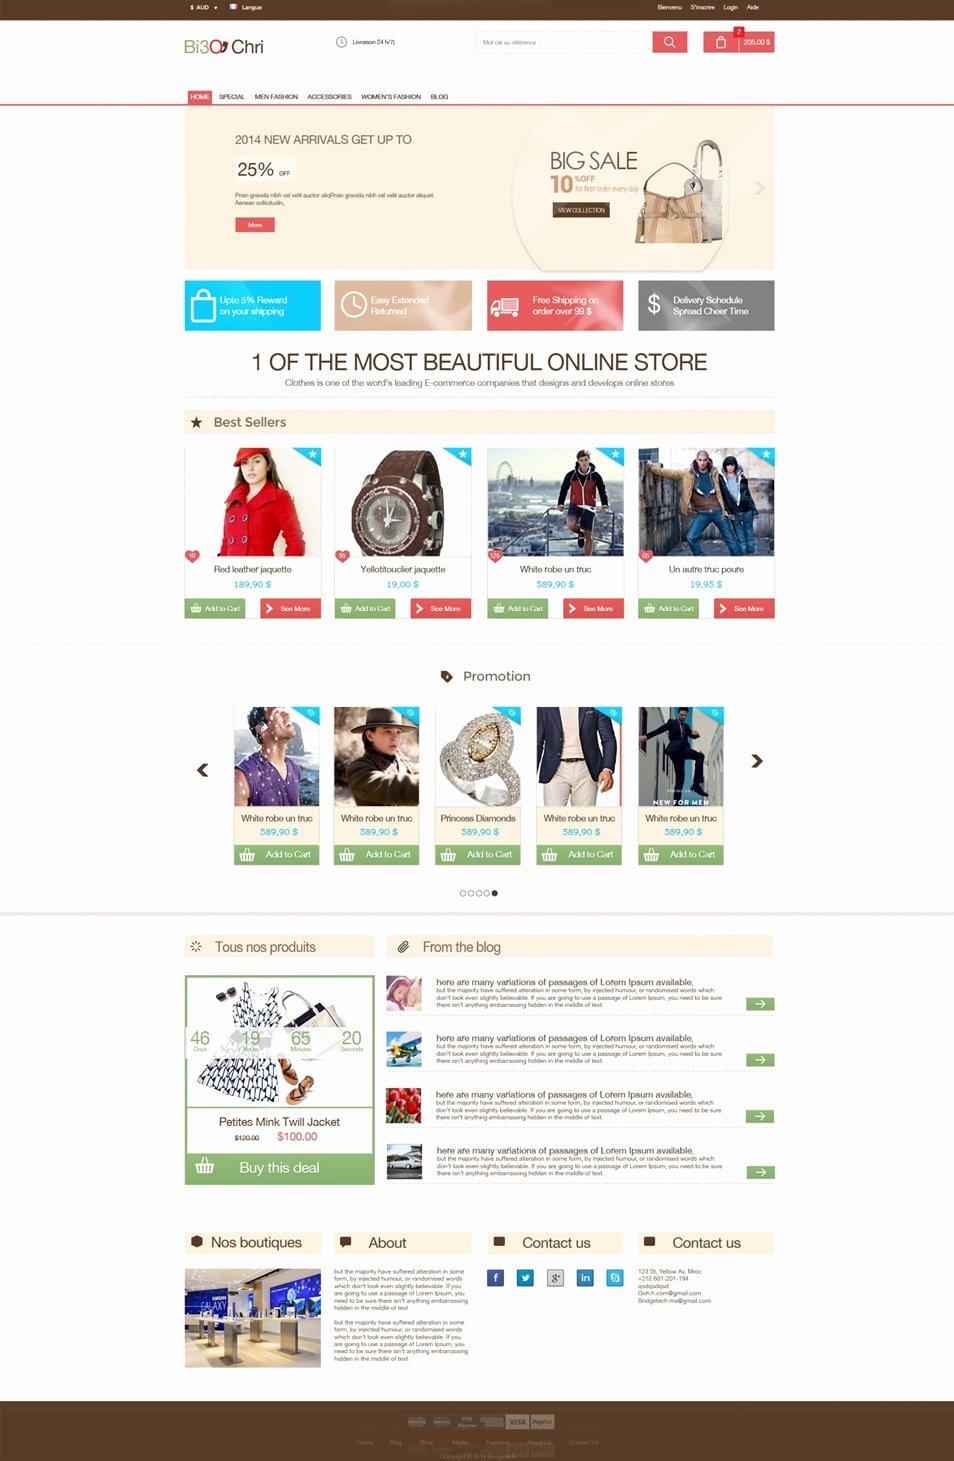 Html Use 20 Best Free Psd E Merce Web Templates 2014 or